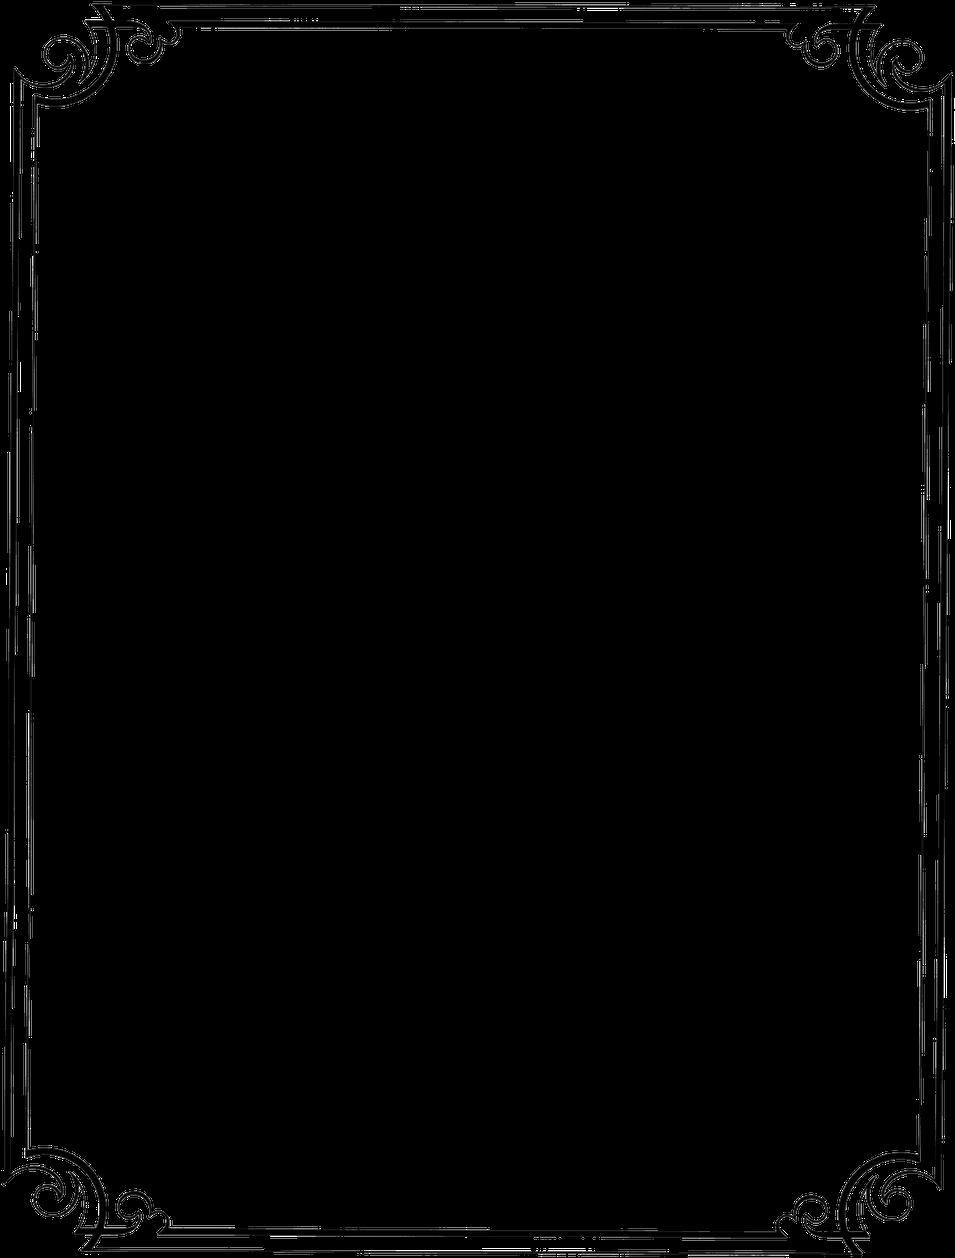 Download Flower Border Line Design Clipart Best Clipgoo Top Invitation Border Designs Png Full Size Png Image Pngkit